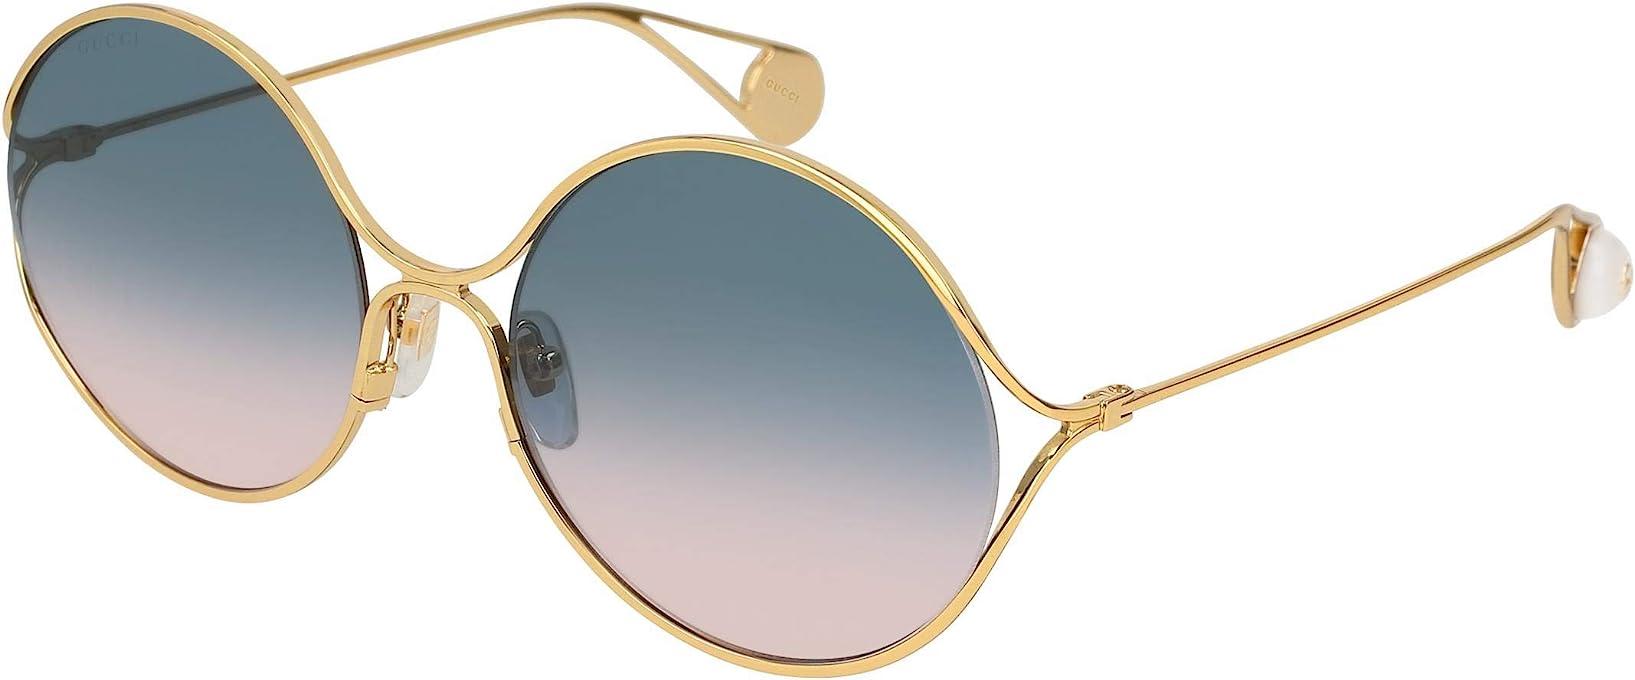 Gucci Women's GG0253S Round Sunglasses, Gold, 58 mm